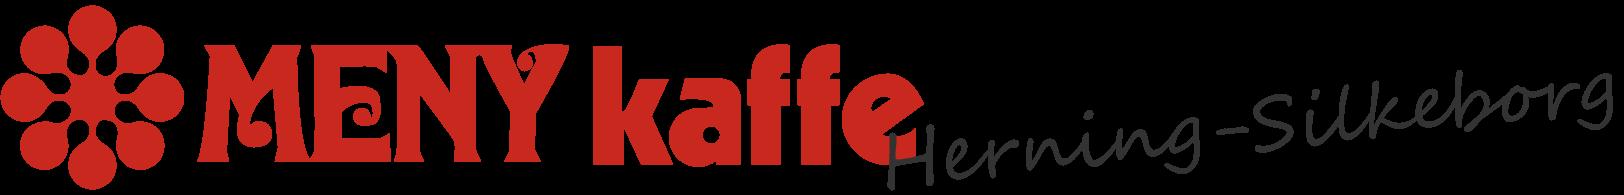 MENYkaffe logo